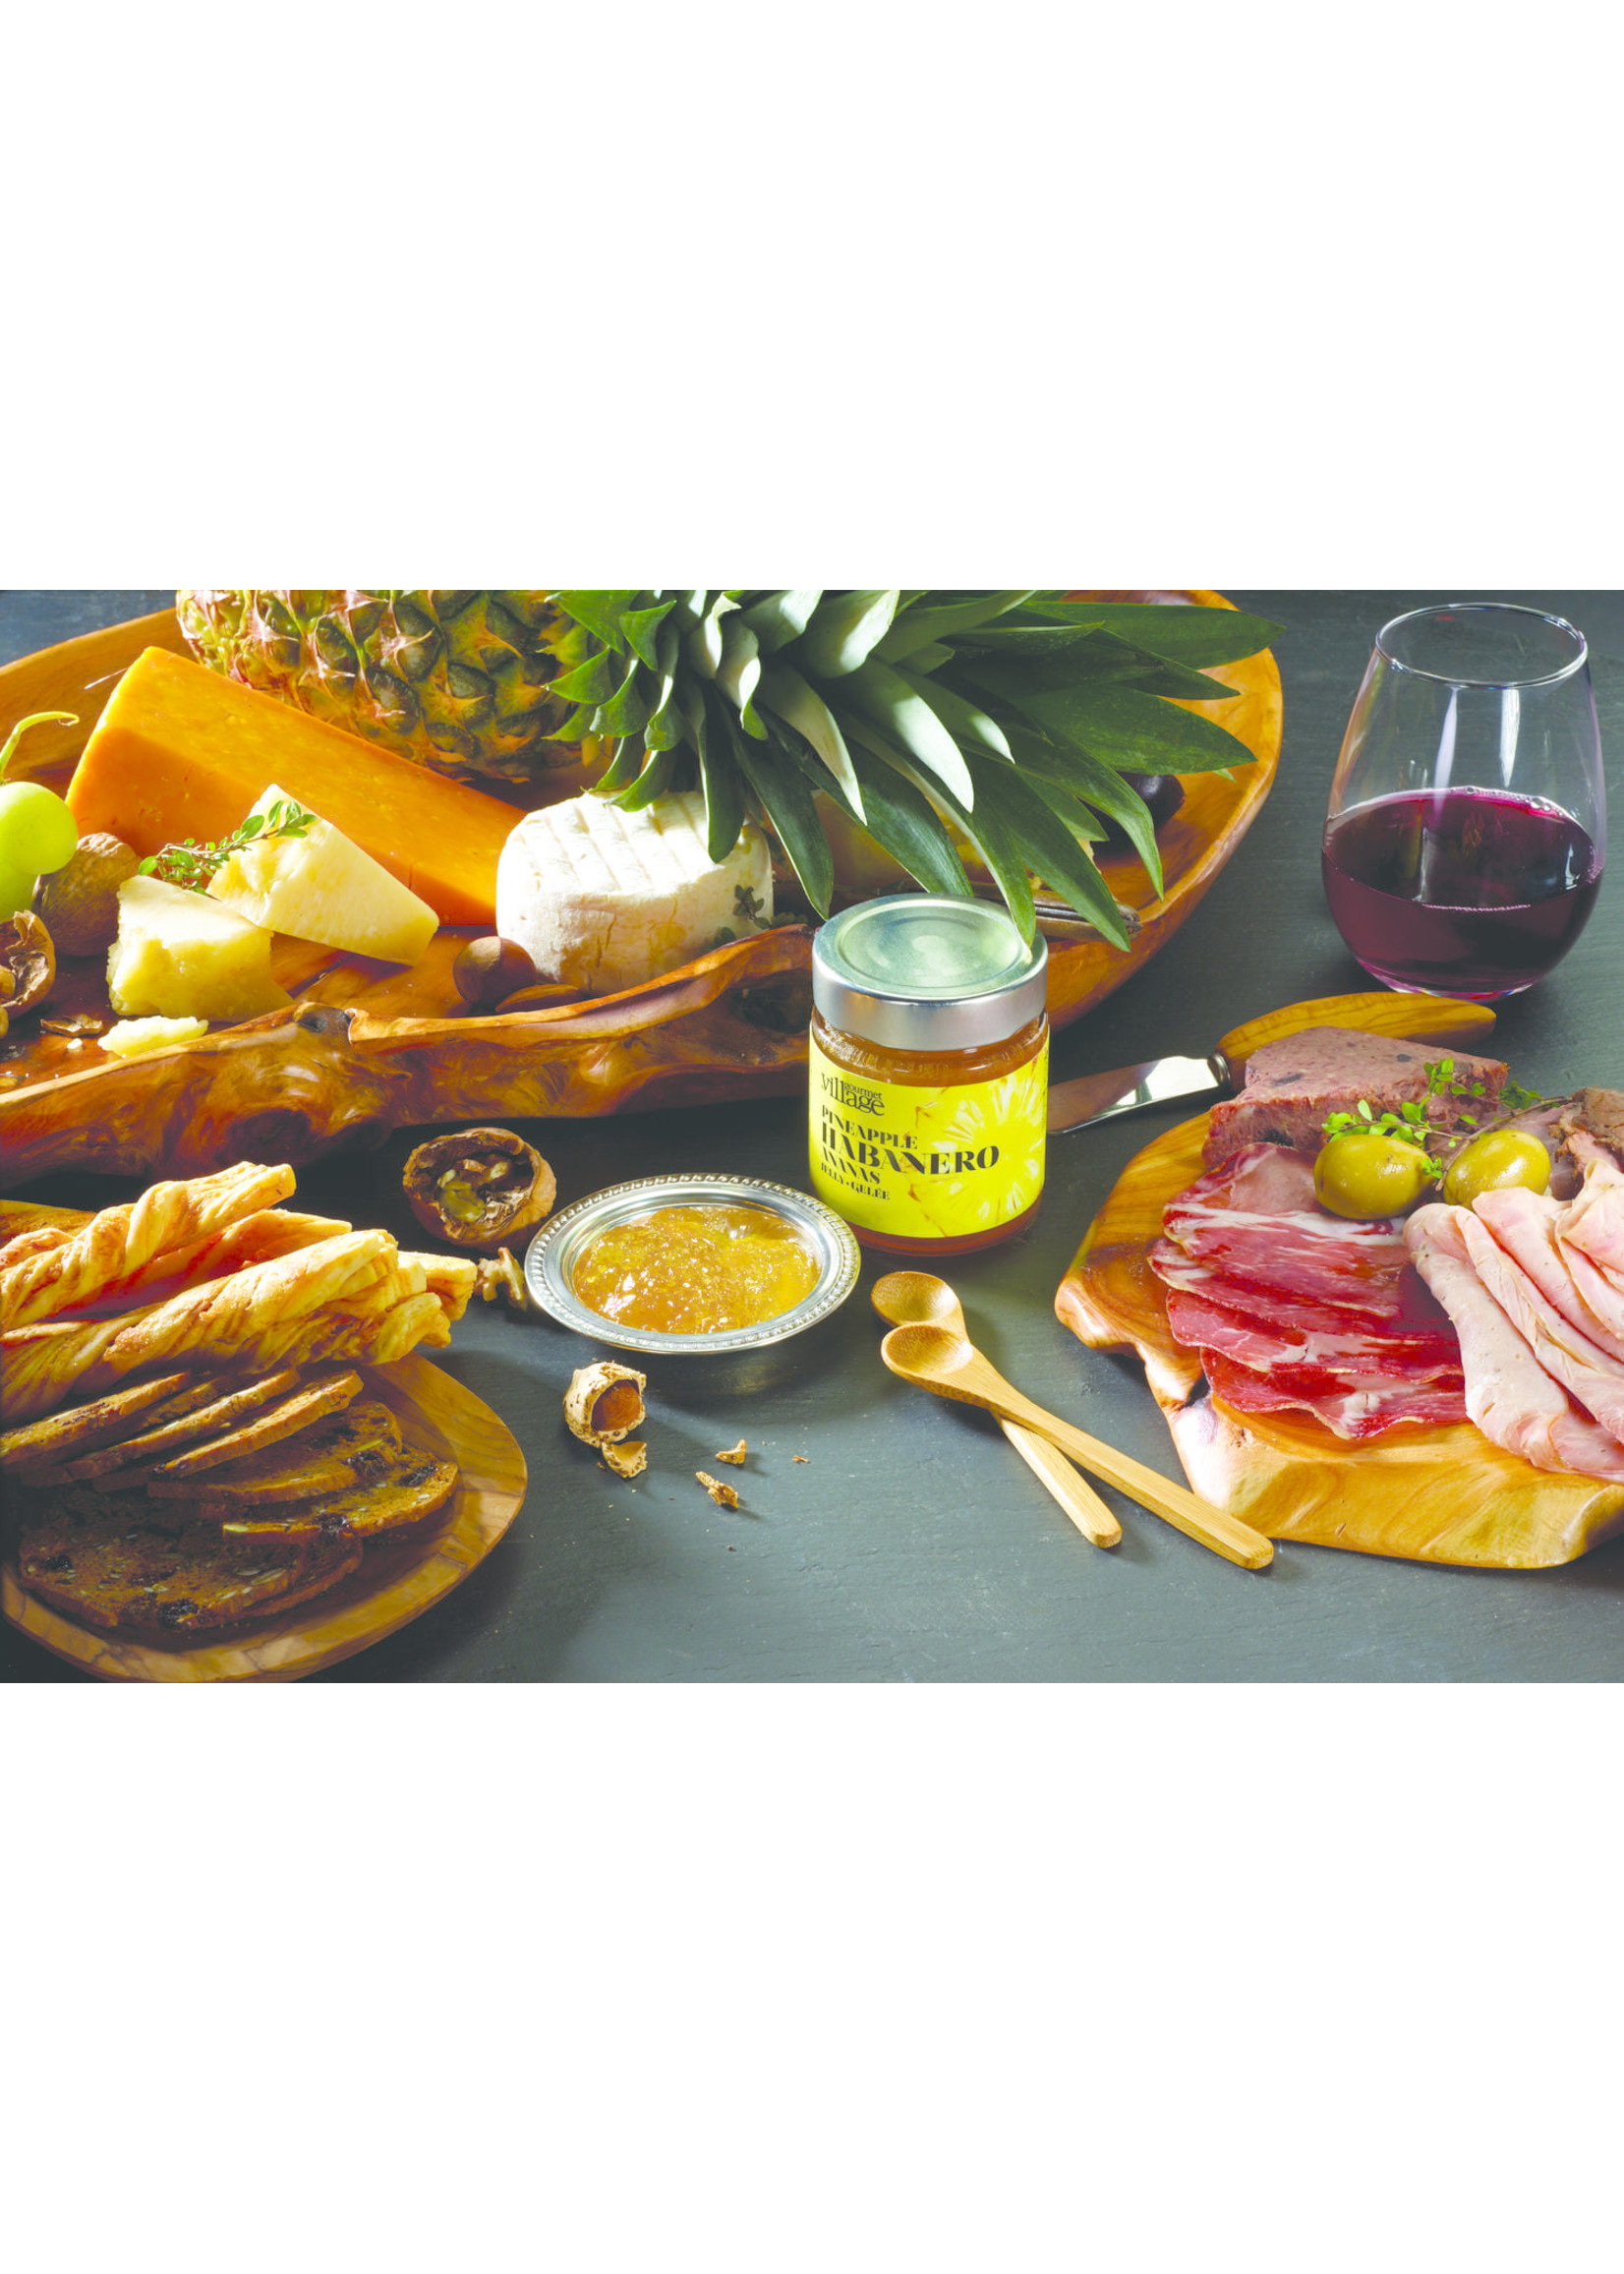 Gourmet Village Pineapple Habanero Jelly